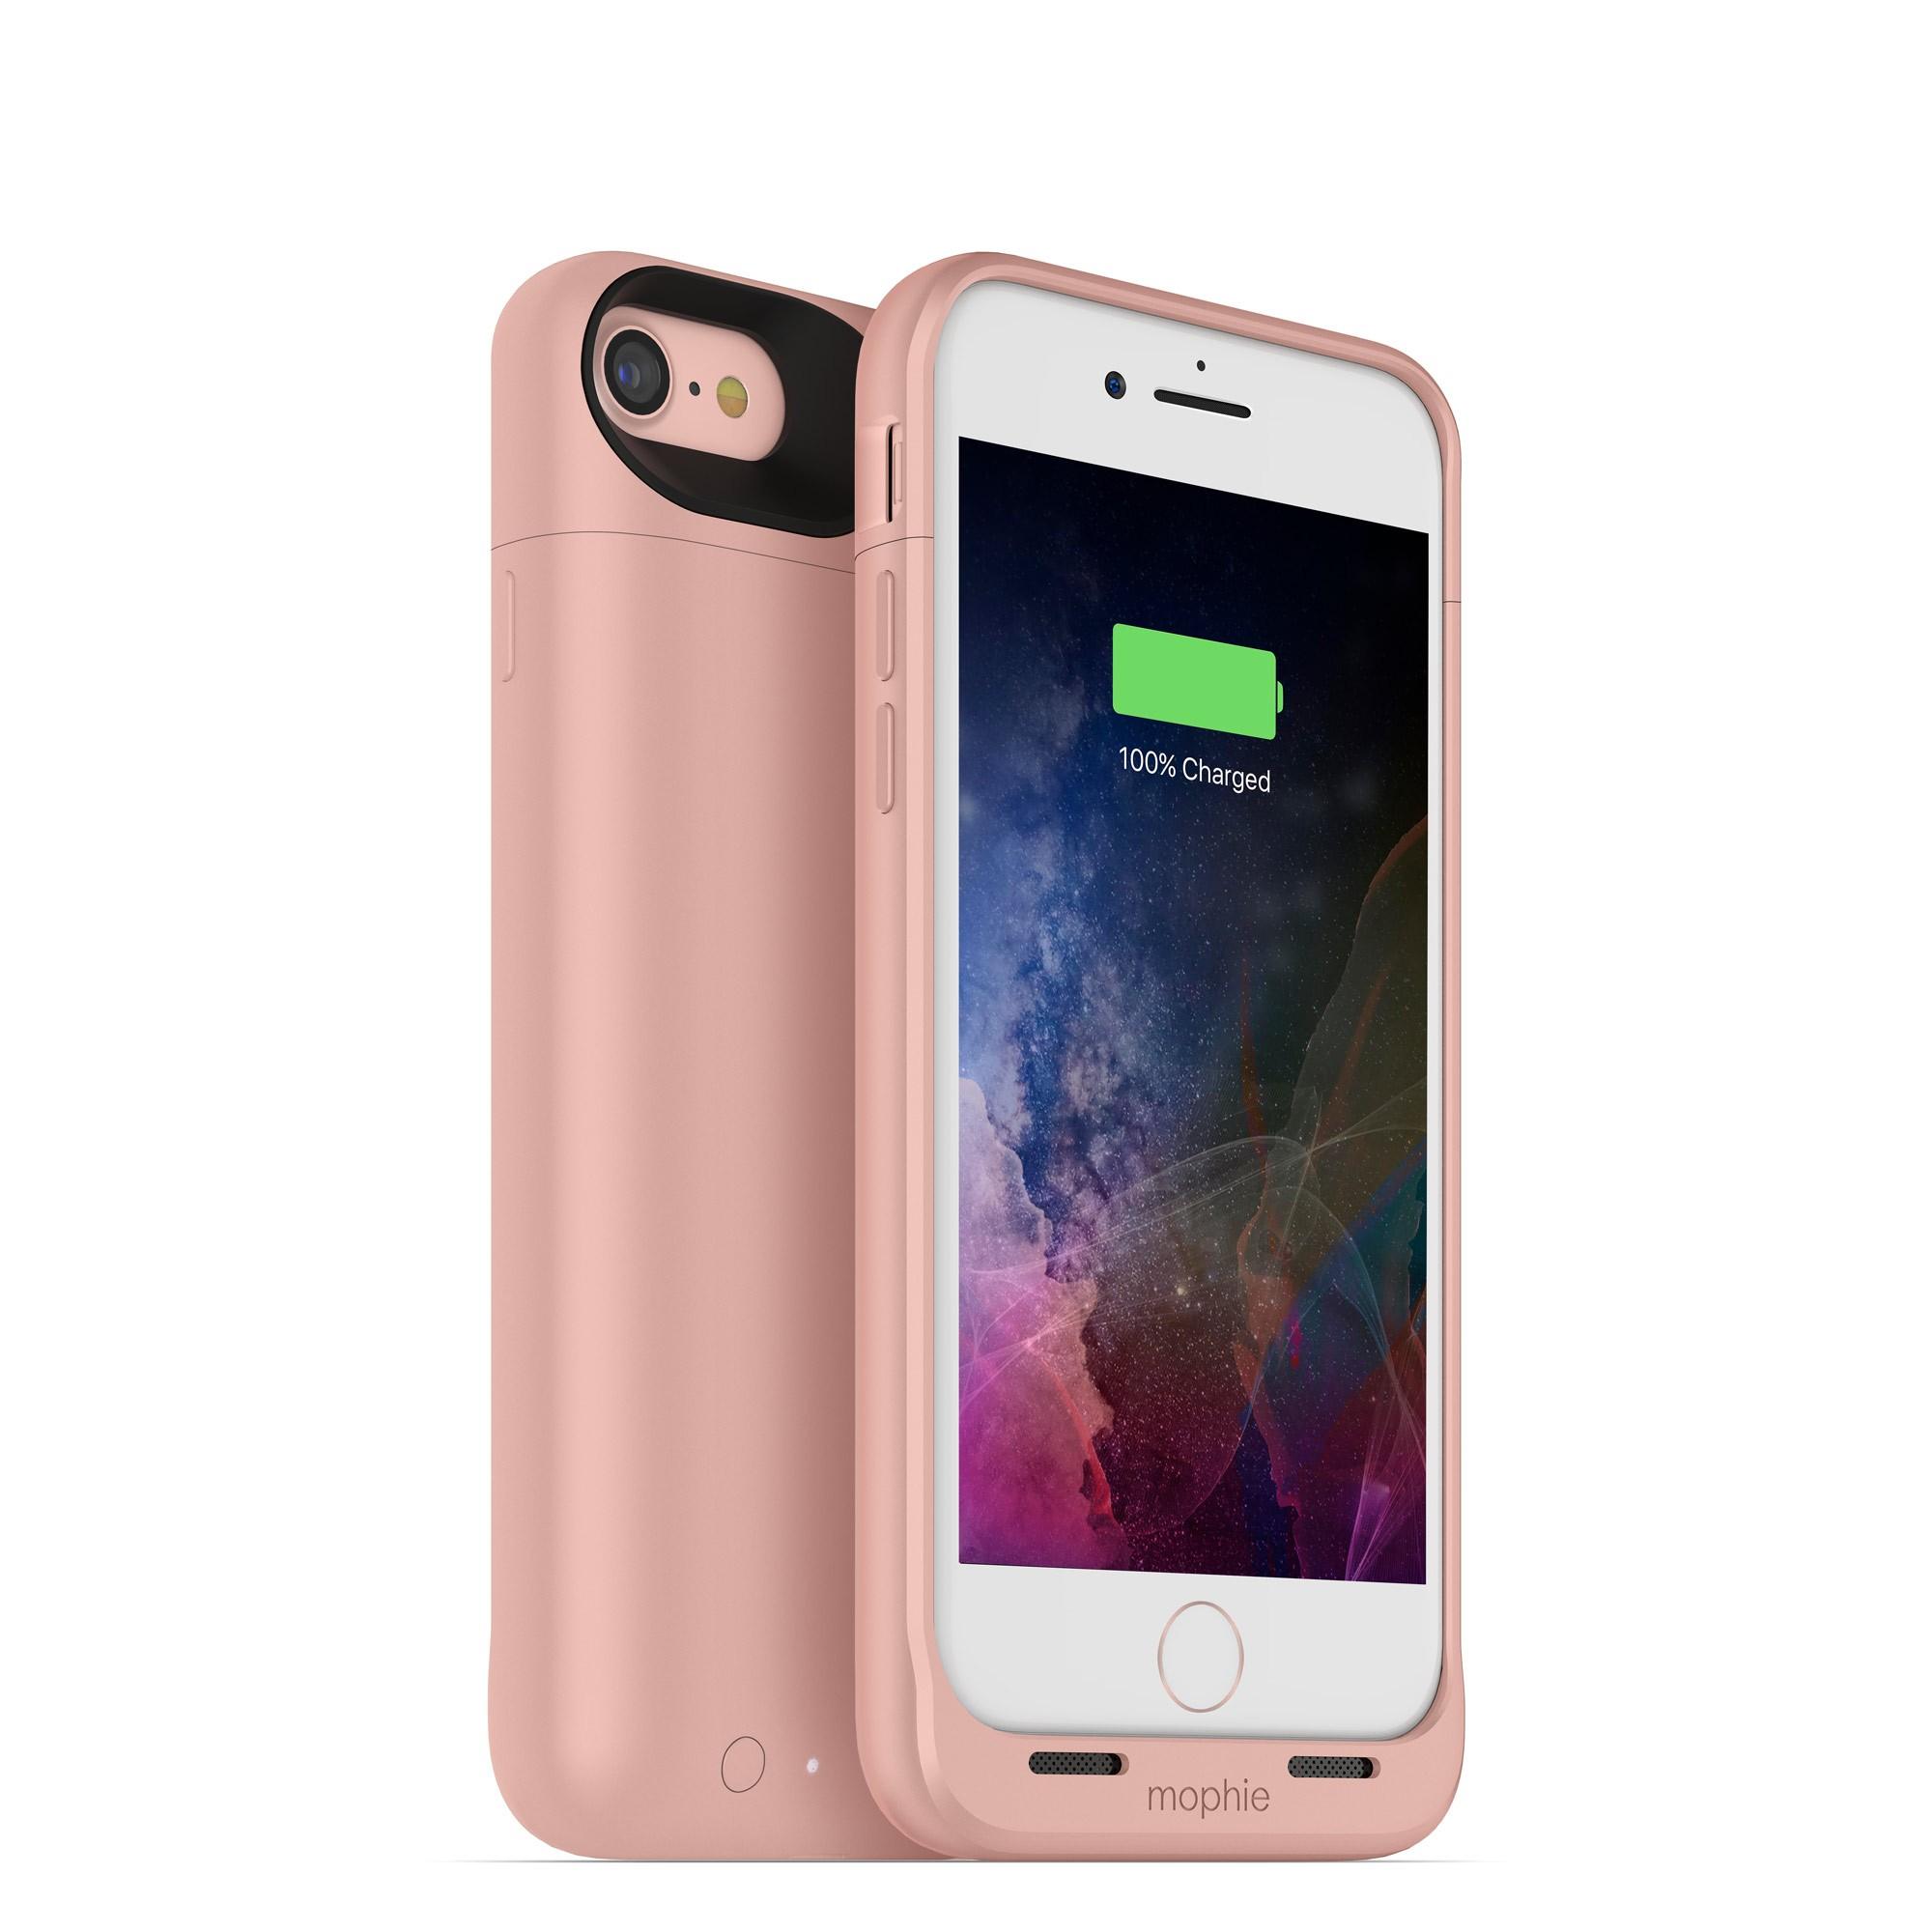 Nabíjecí pouzdro pro Apple iPhone 7 - Mophie, Juice Pack Air 2525mAh Rose Gold